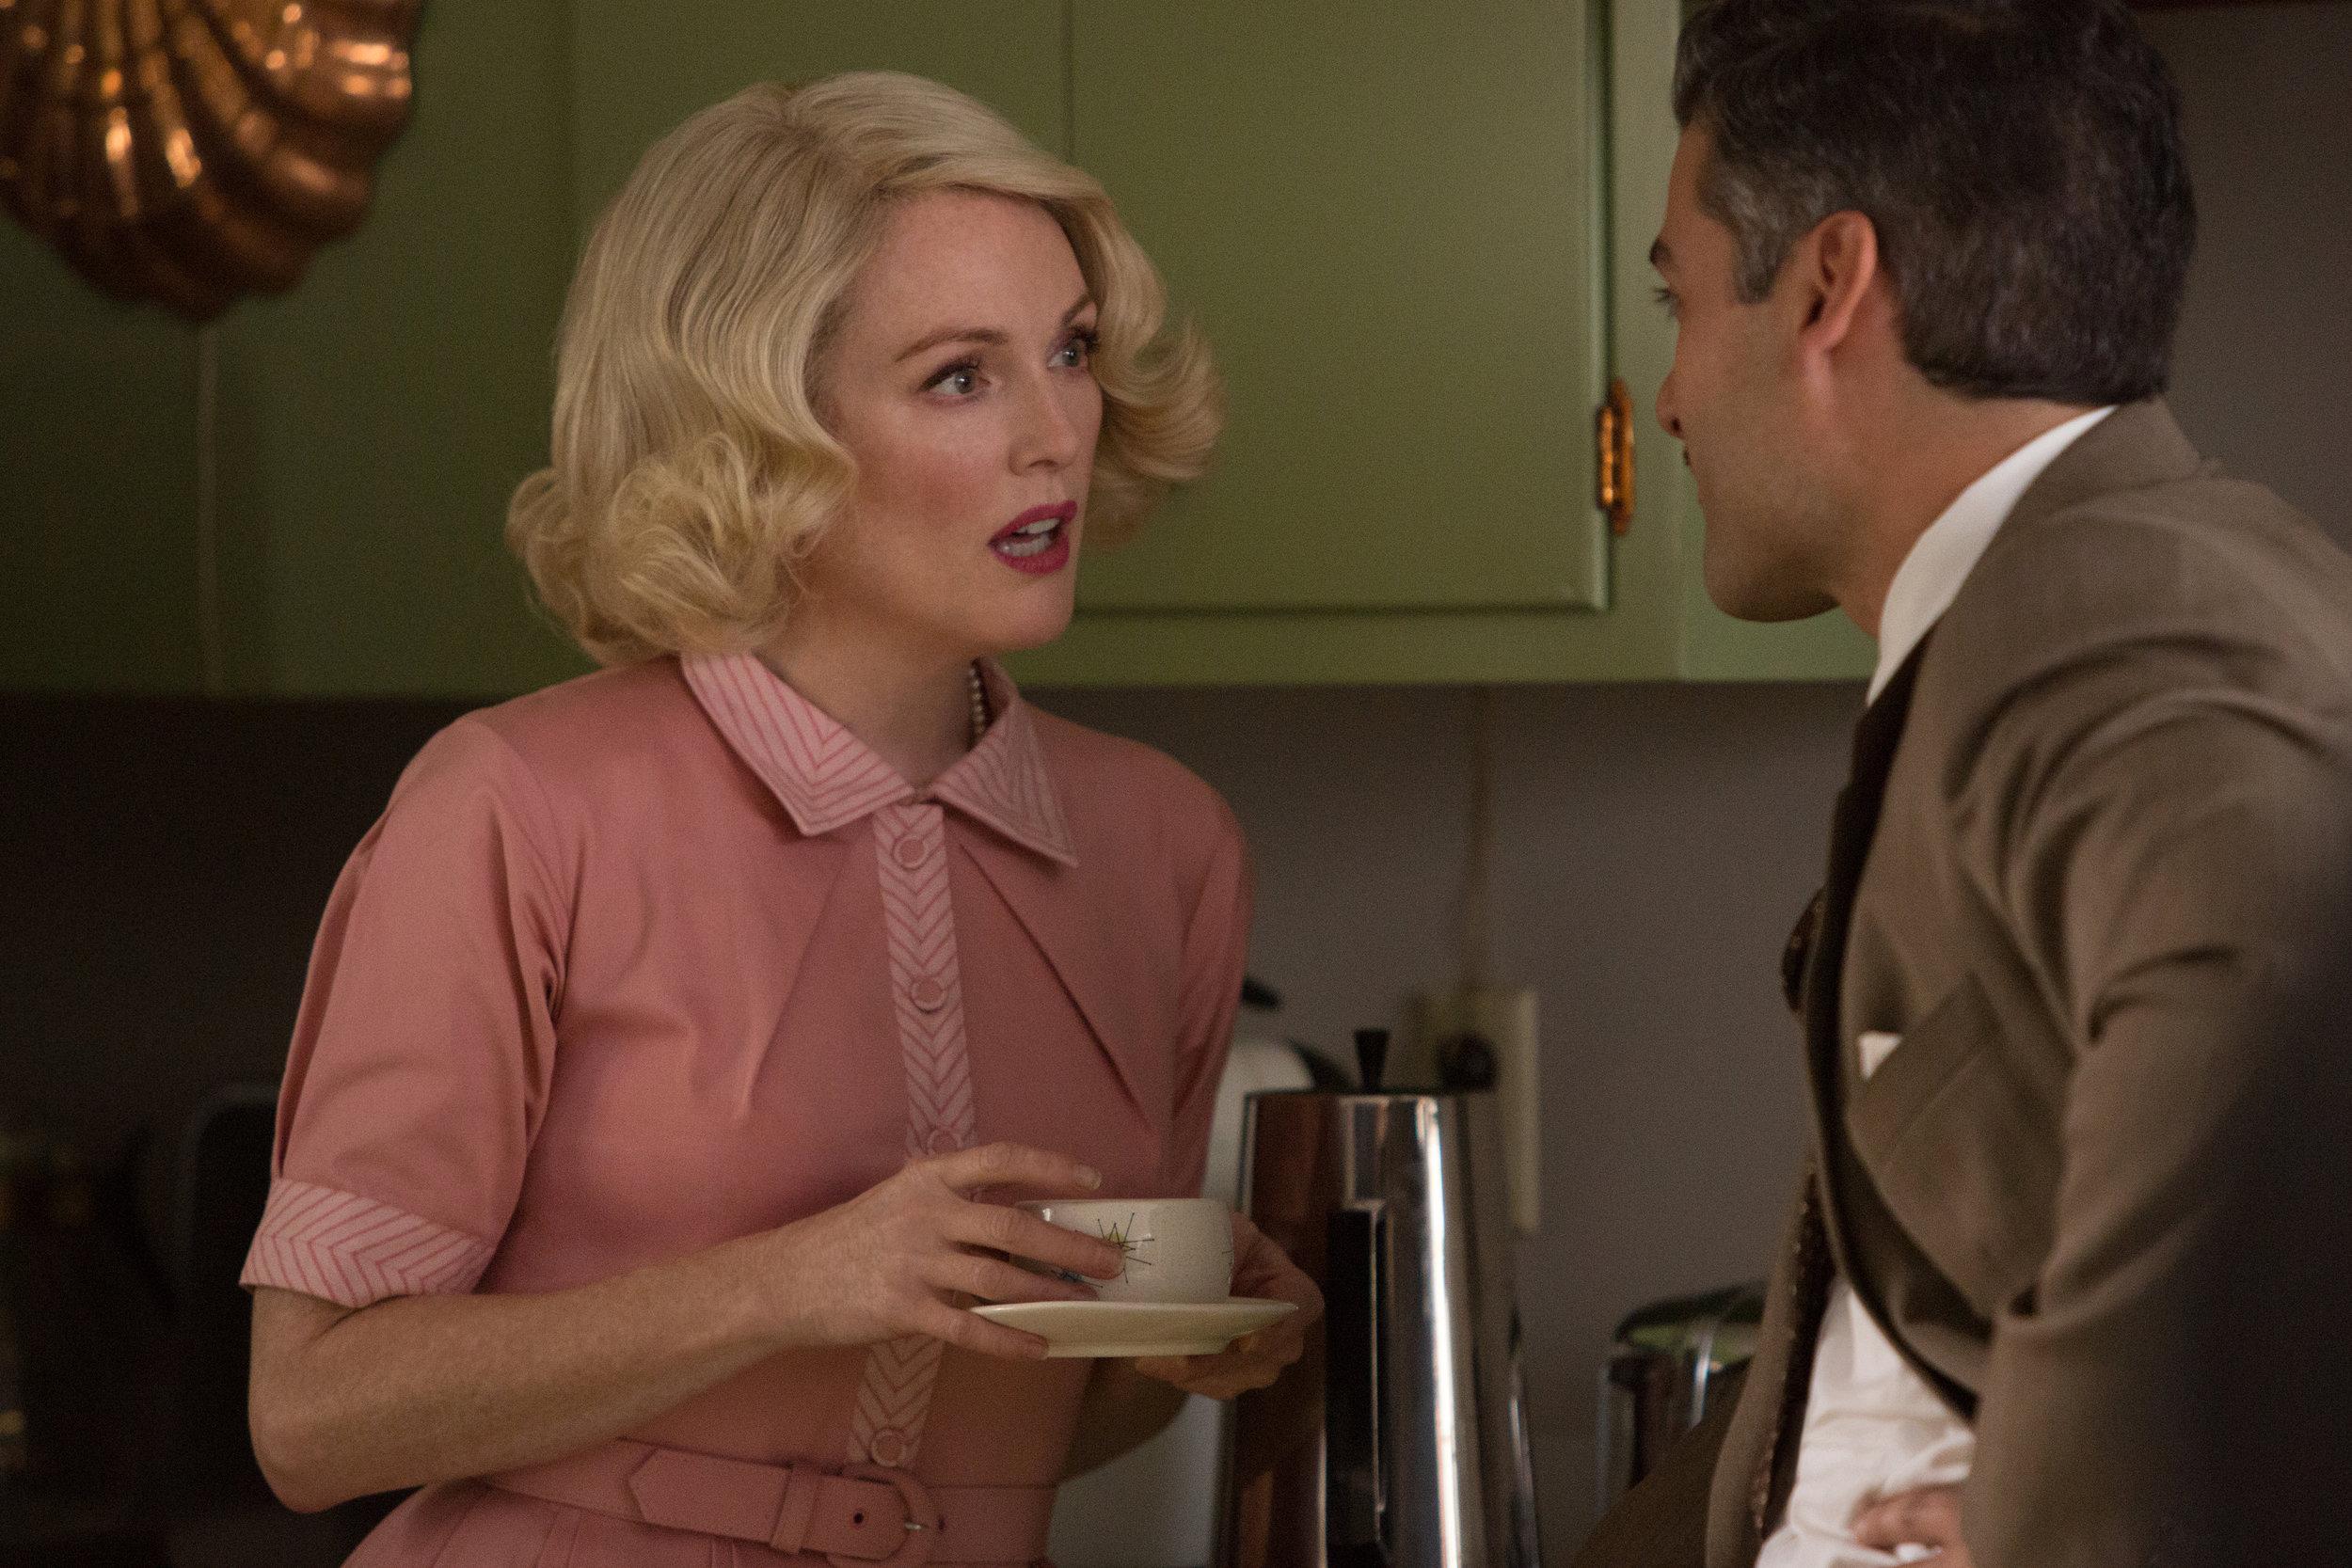 Julianne Moore and Oscar Isaac exchange unpleasantries. (Paramount)